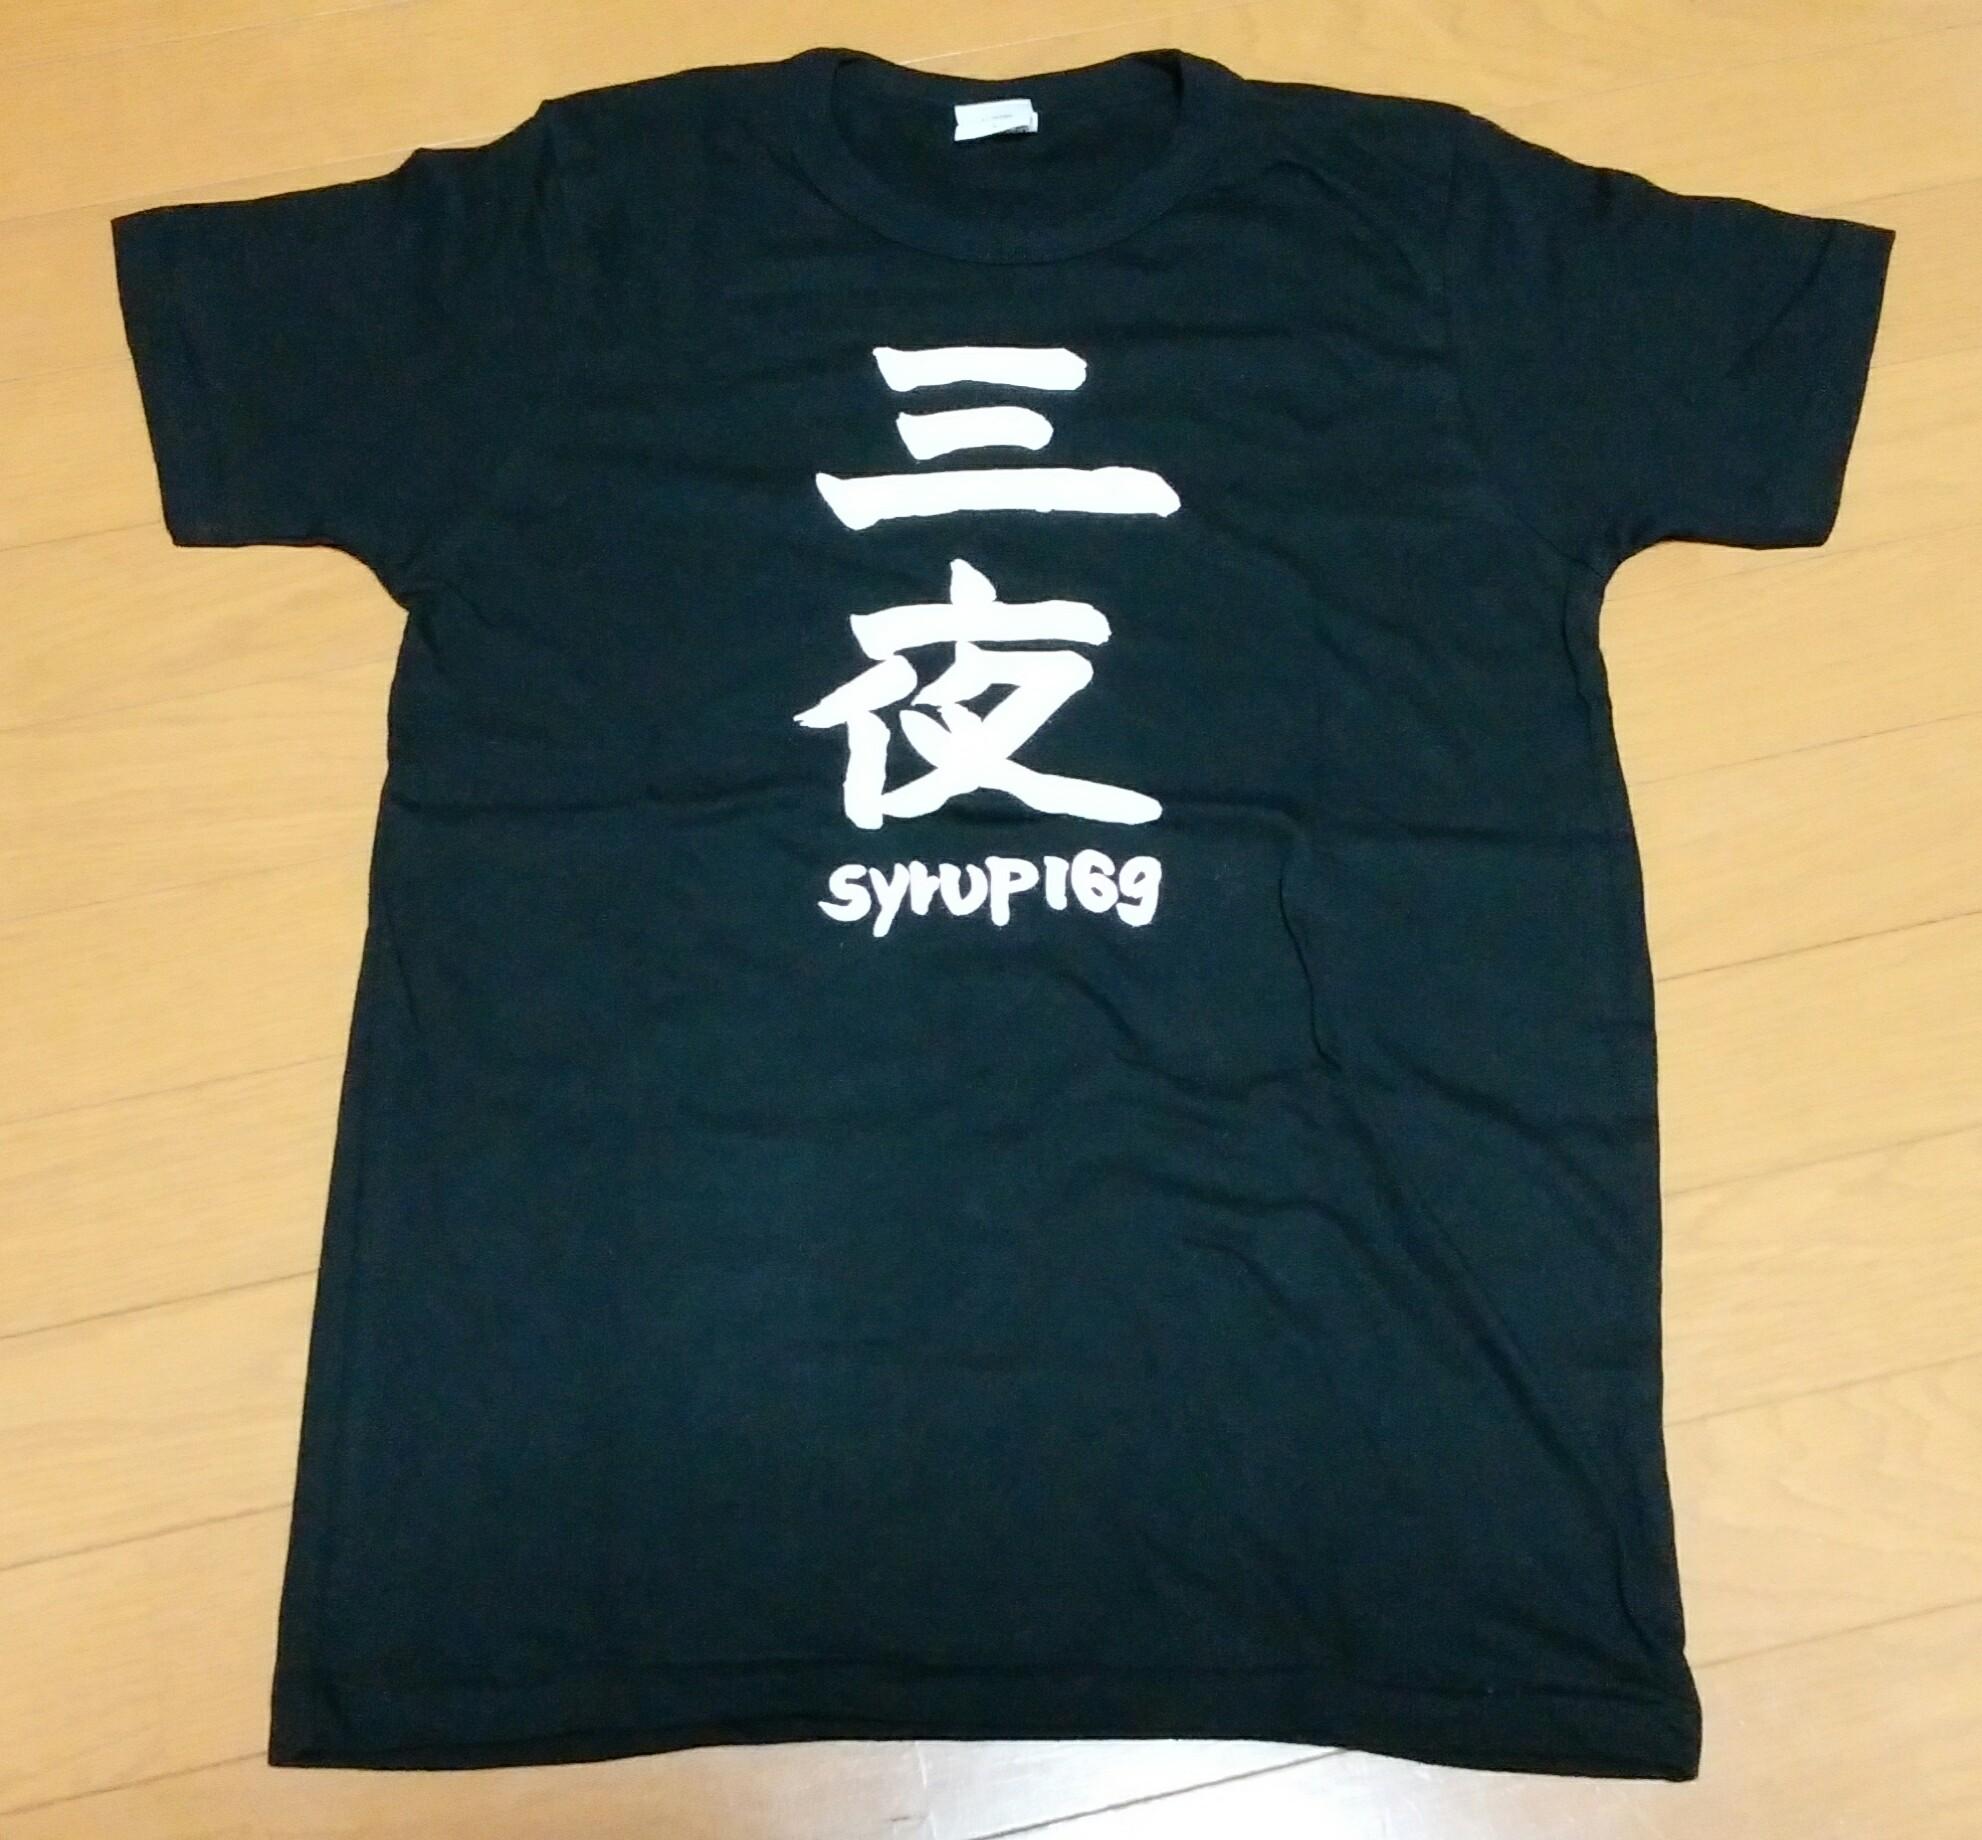 syrup16g COPY発売16周年記念ツアー『十六夜 <IZAYOI>』@広島クラブクアトロ 2017.10.10